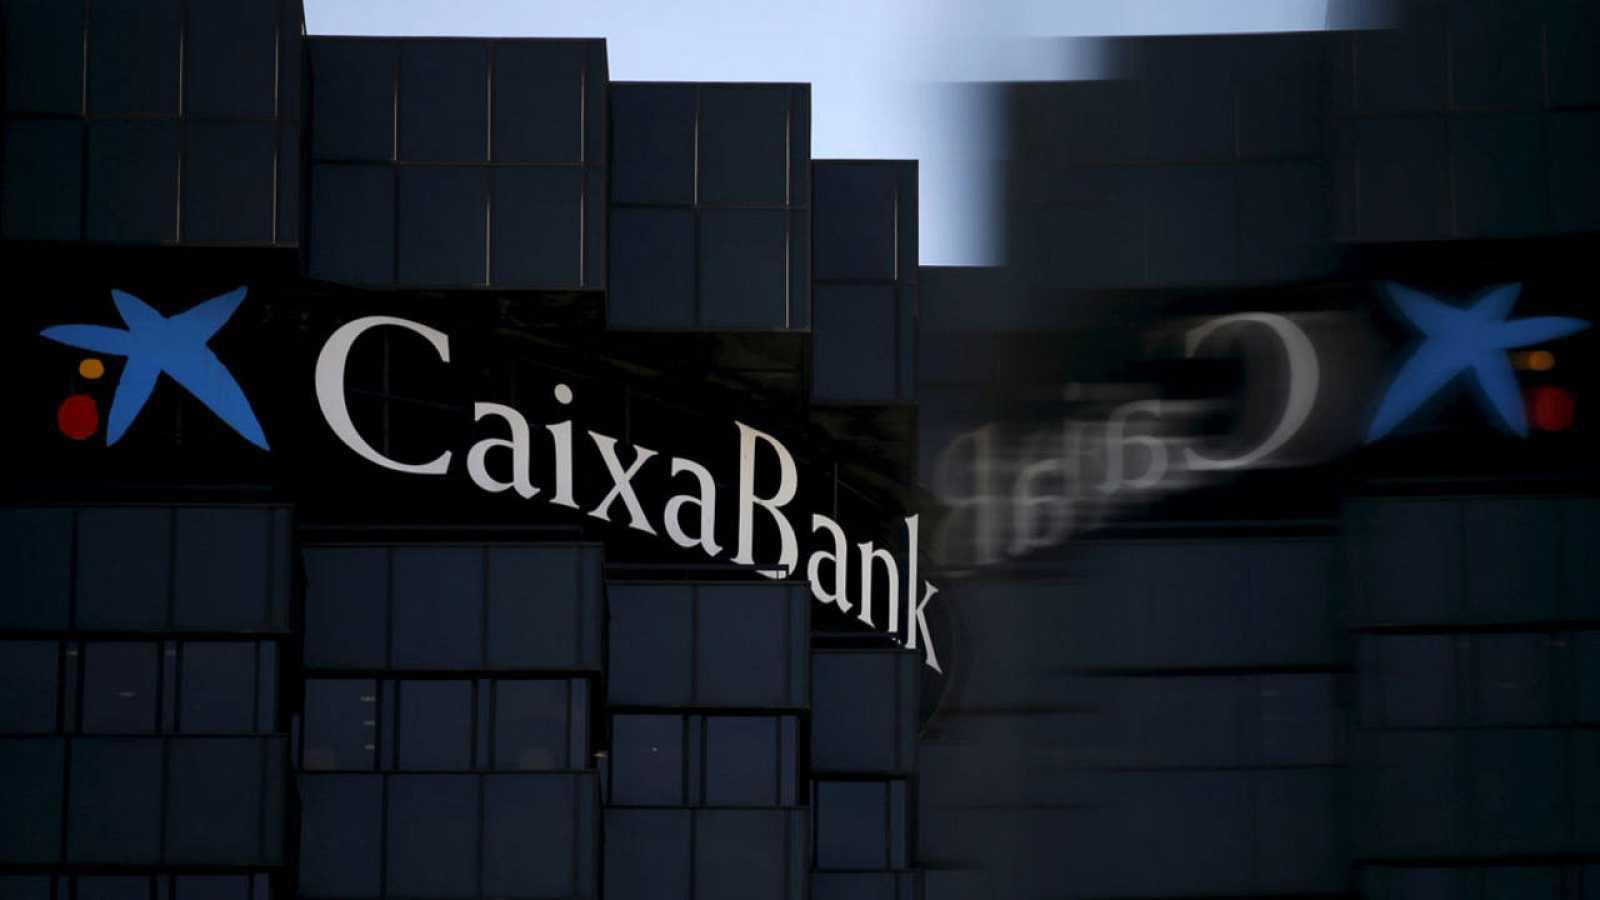 Edificio corporativo de CaixaBank